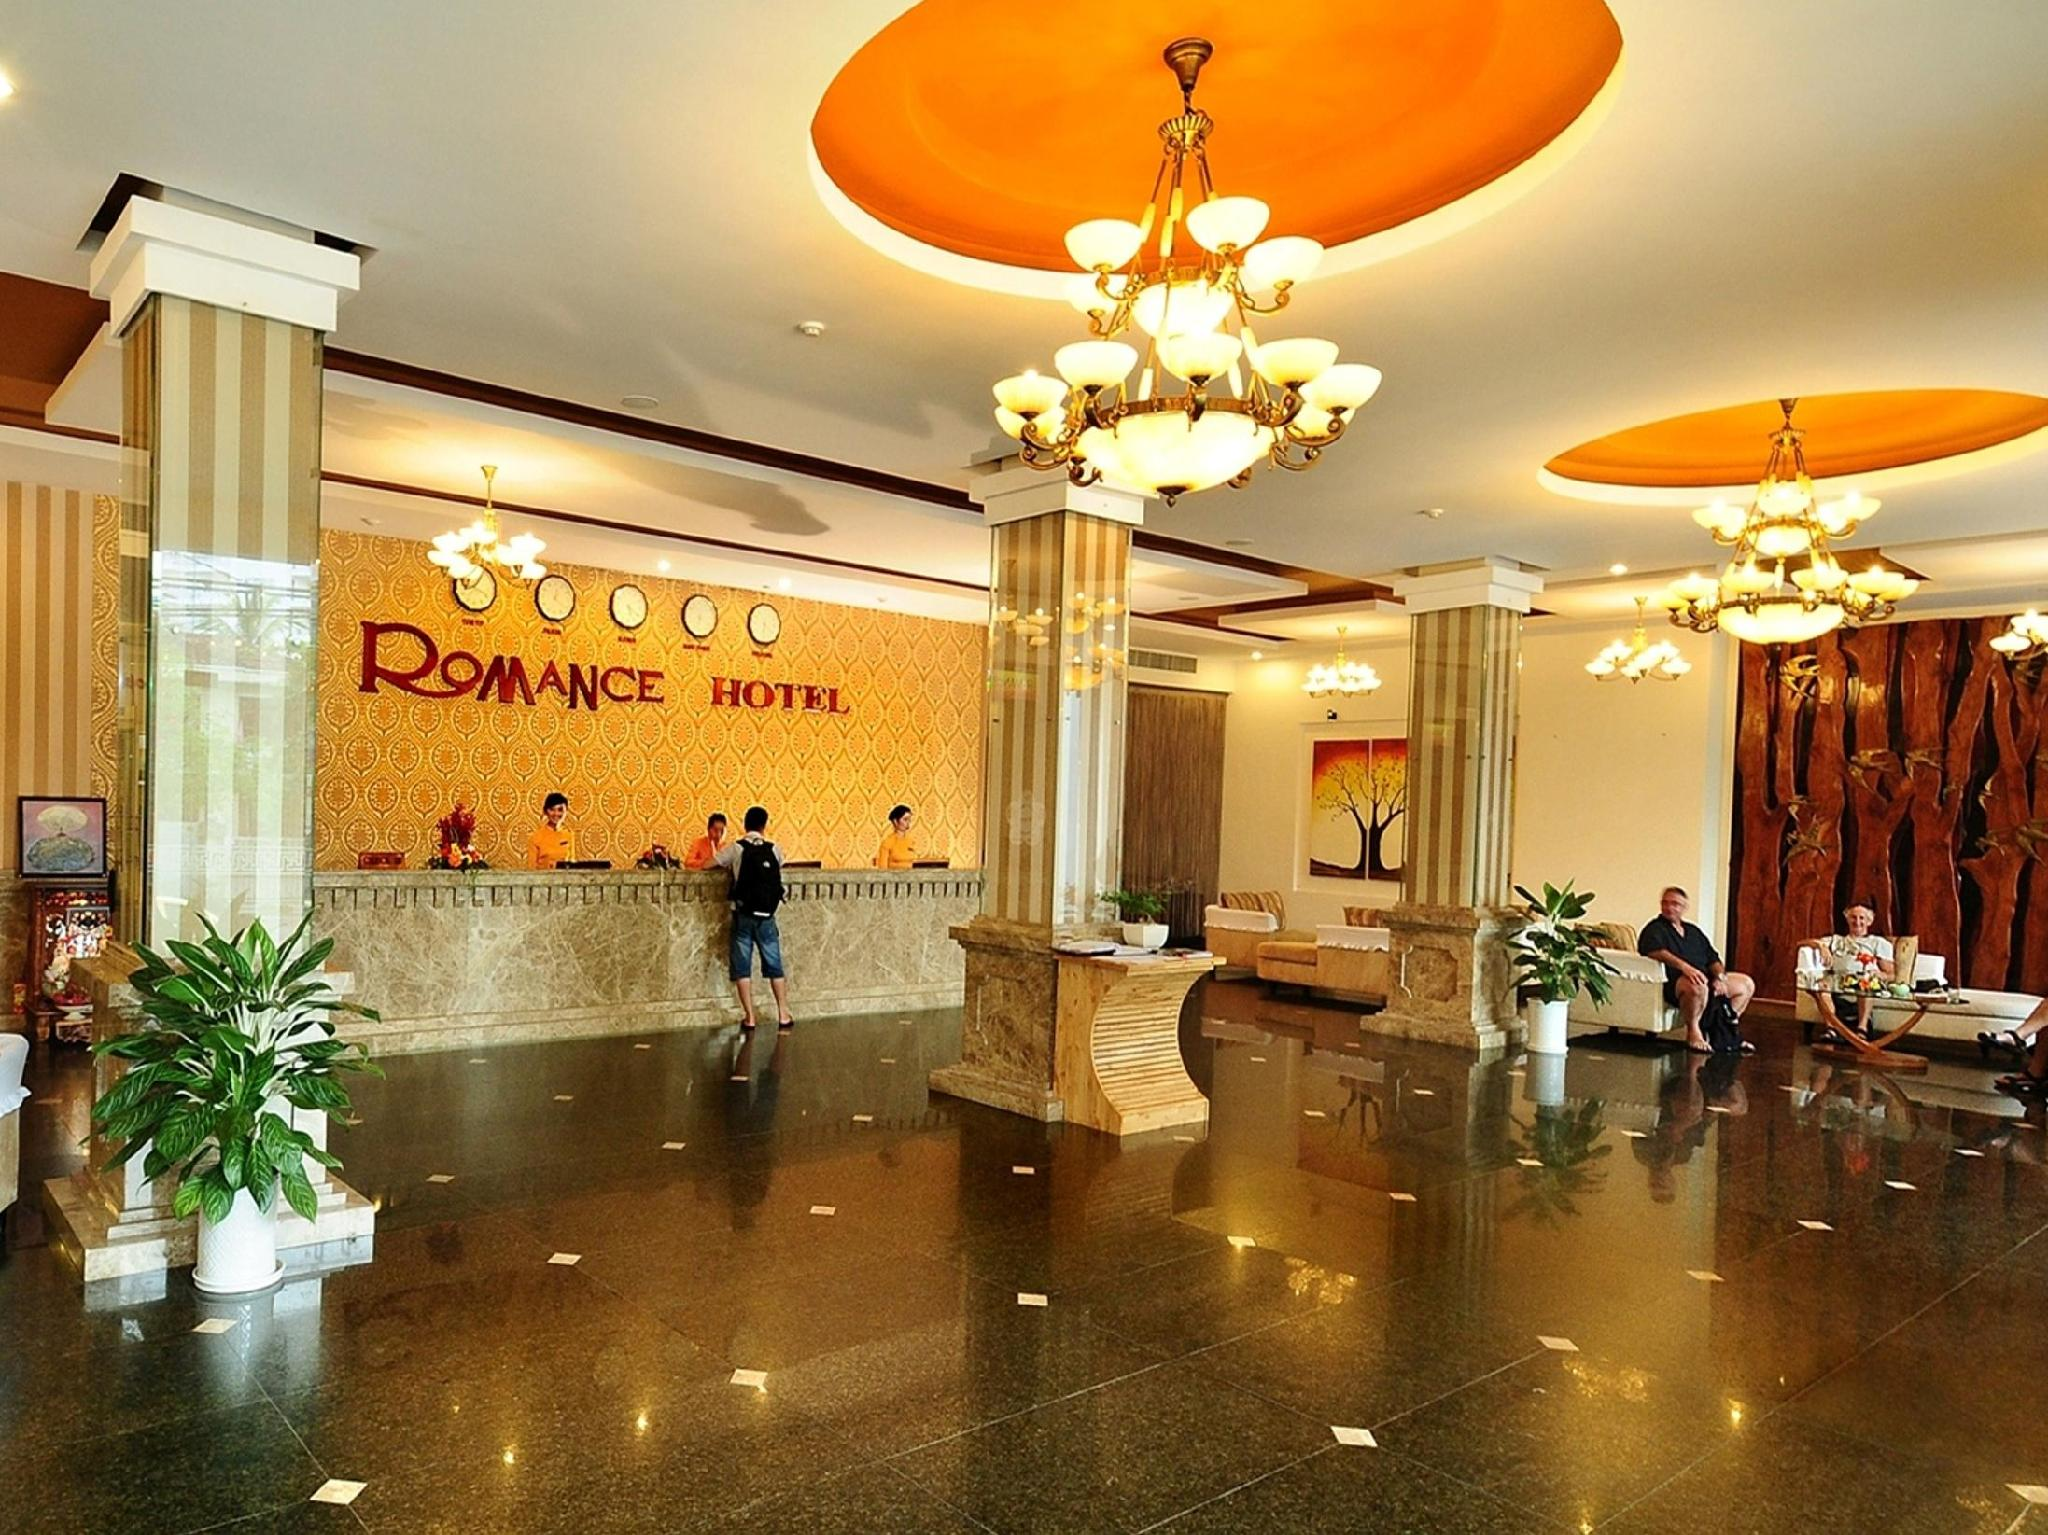 Hotell Romance Hotel